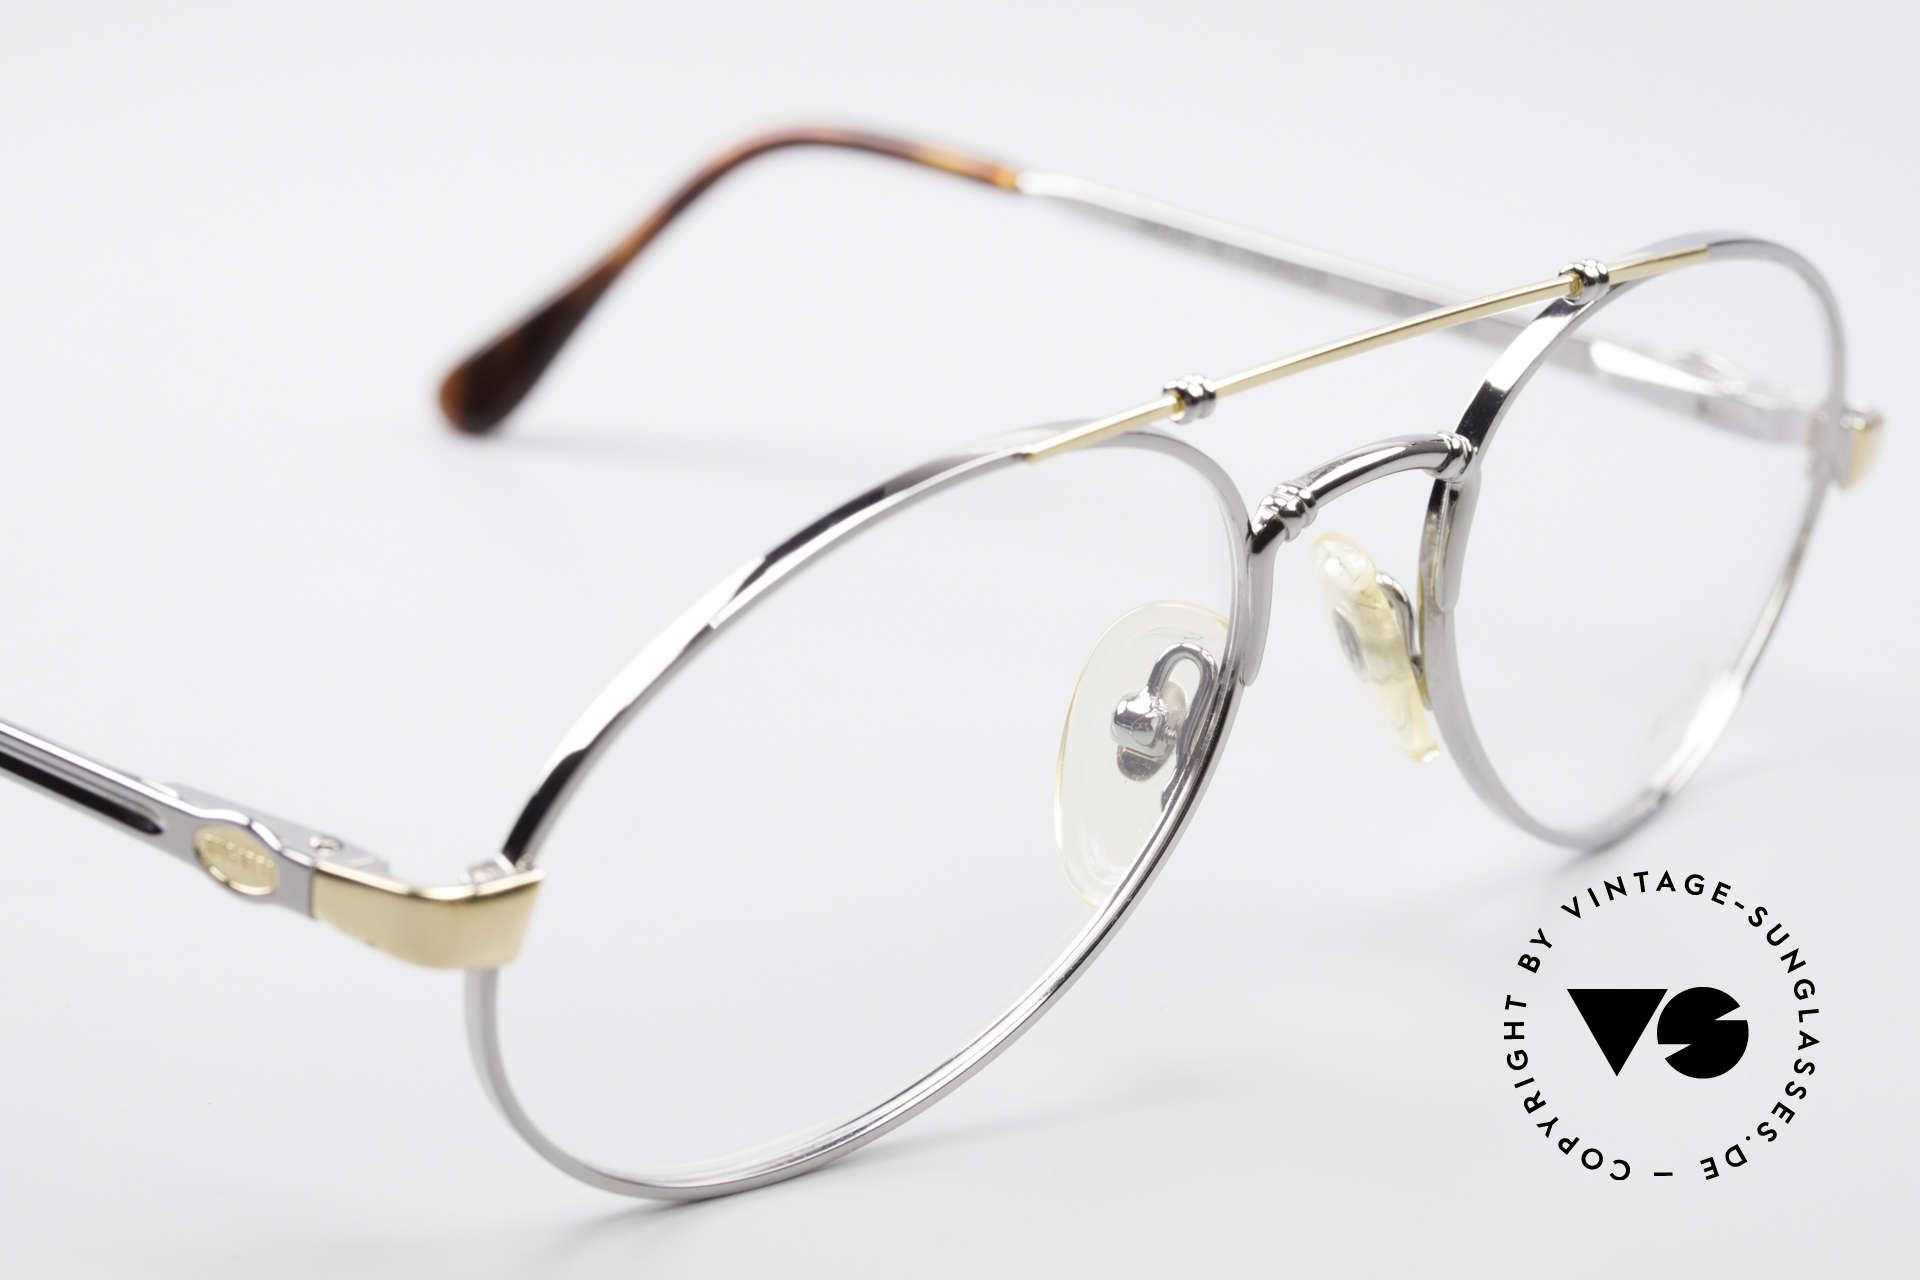 Bugatti 18526 Men's 80's Luxury Eyeglasses, unworn (like all our rare vintage BUGATTI frames), Made for Men